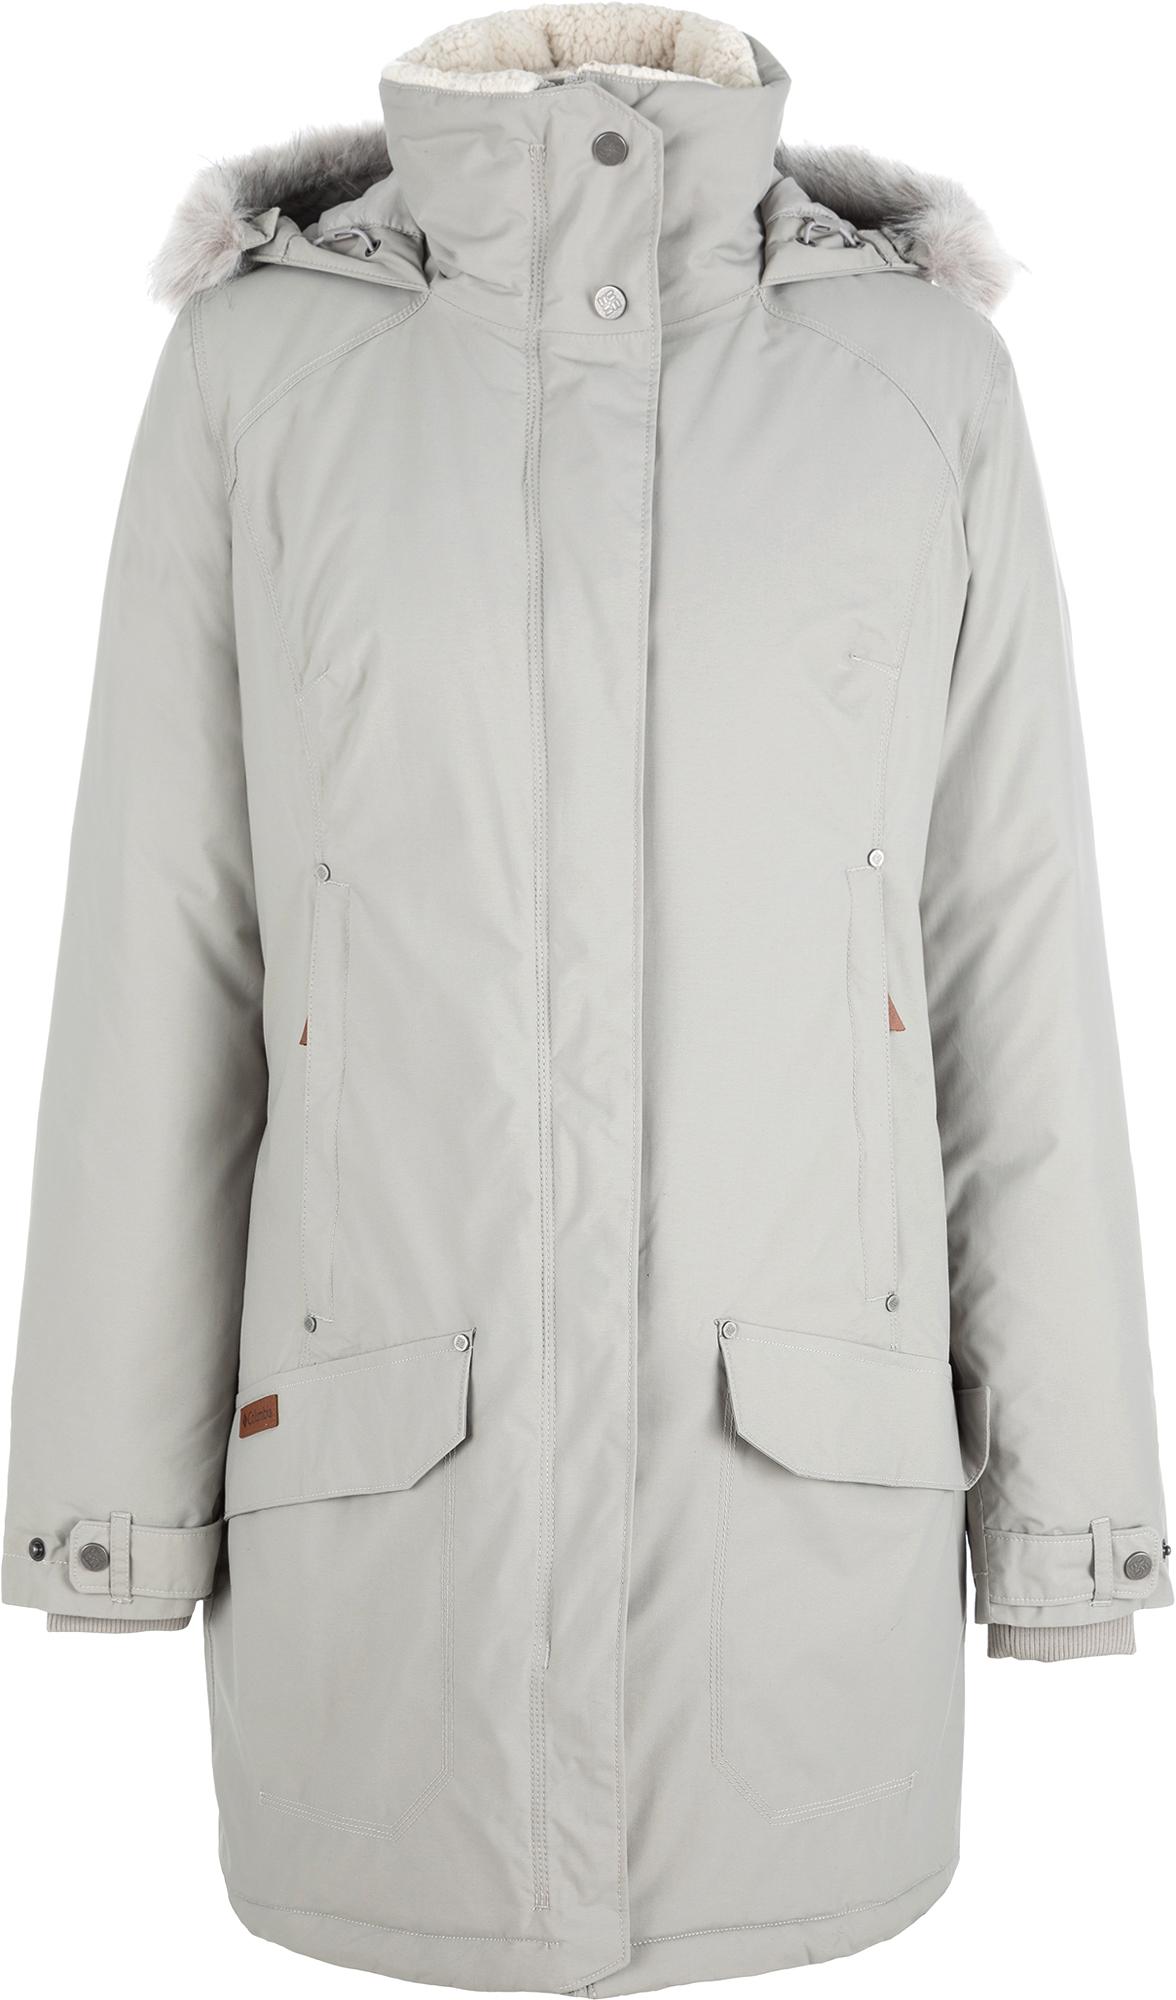 Columbia Куртка пуховая женская Icelandite TurboDown, размер 46